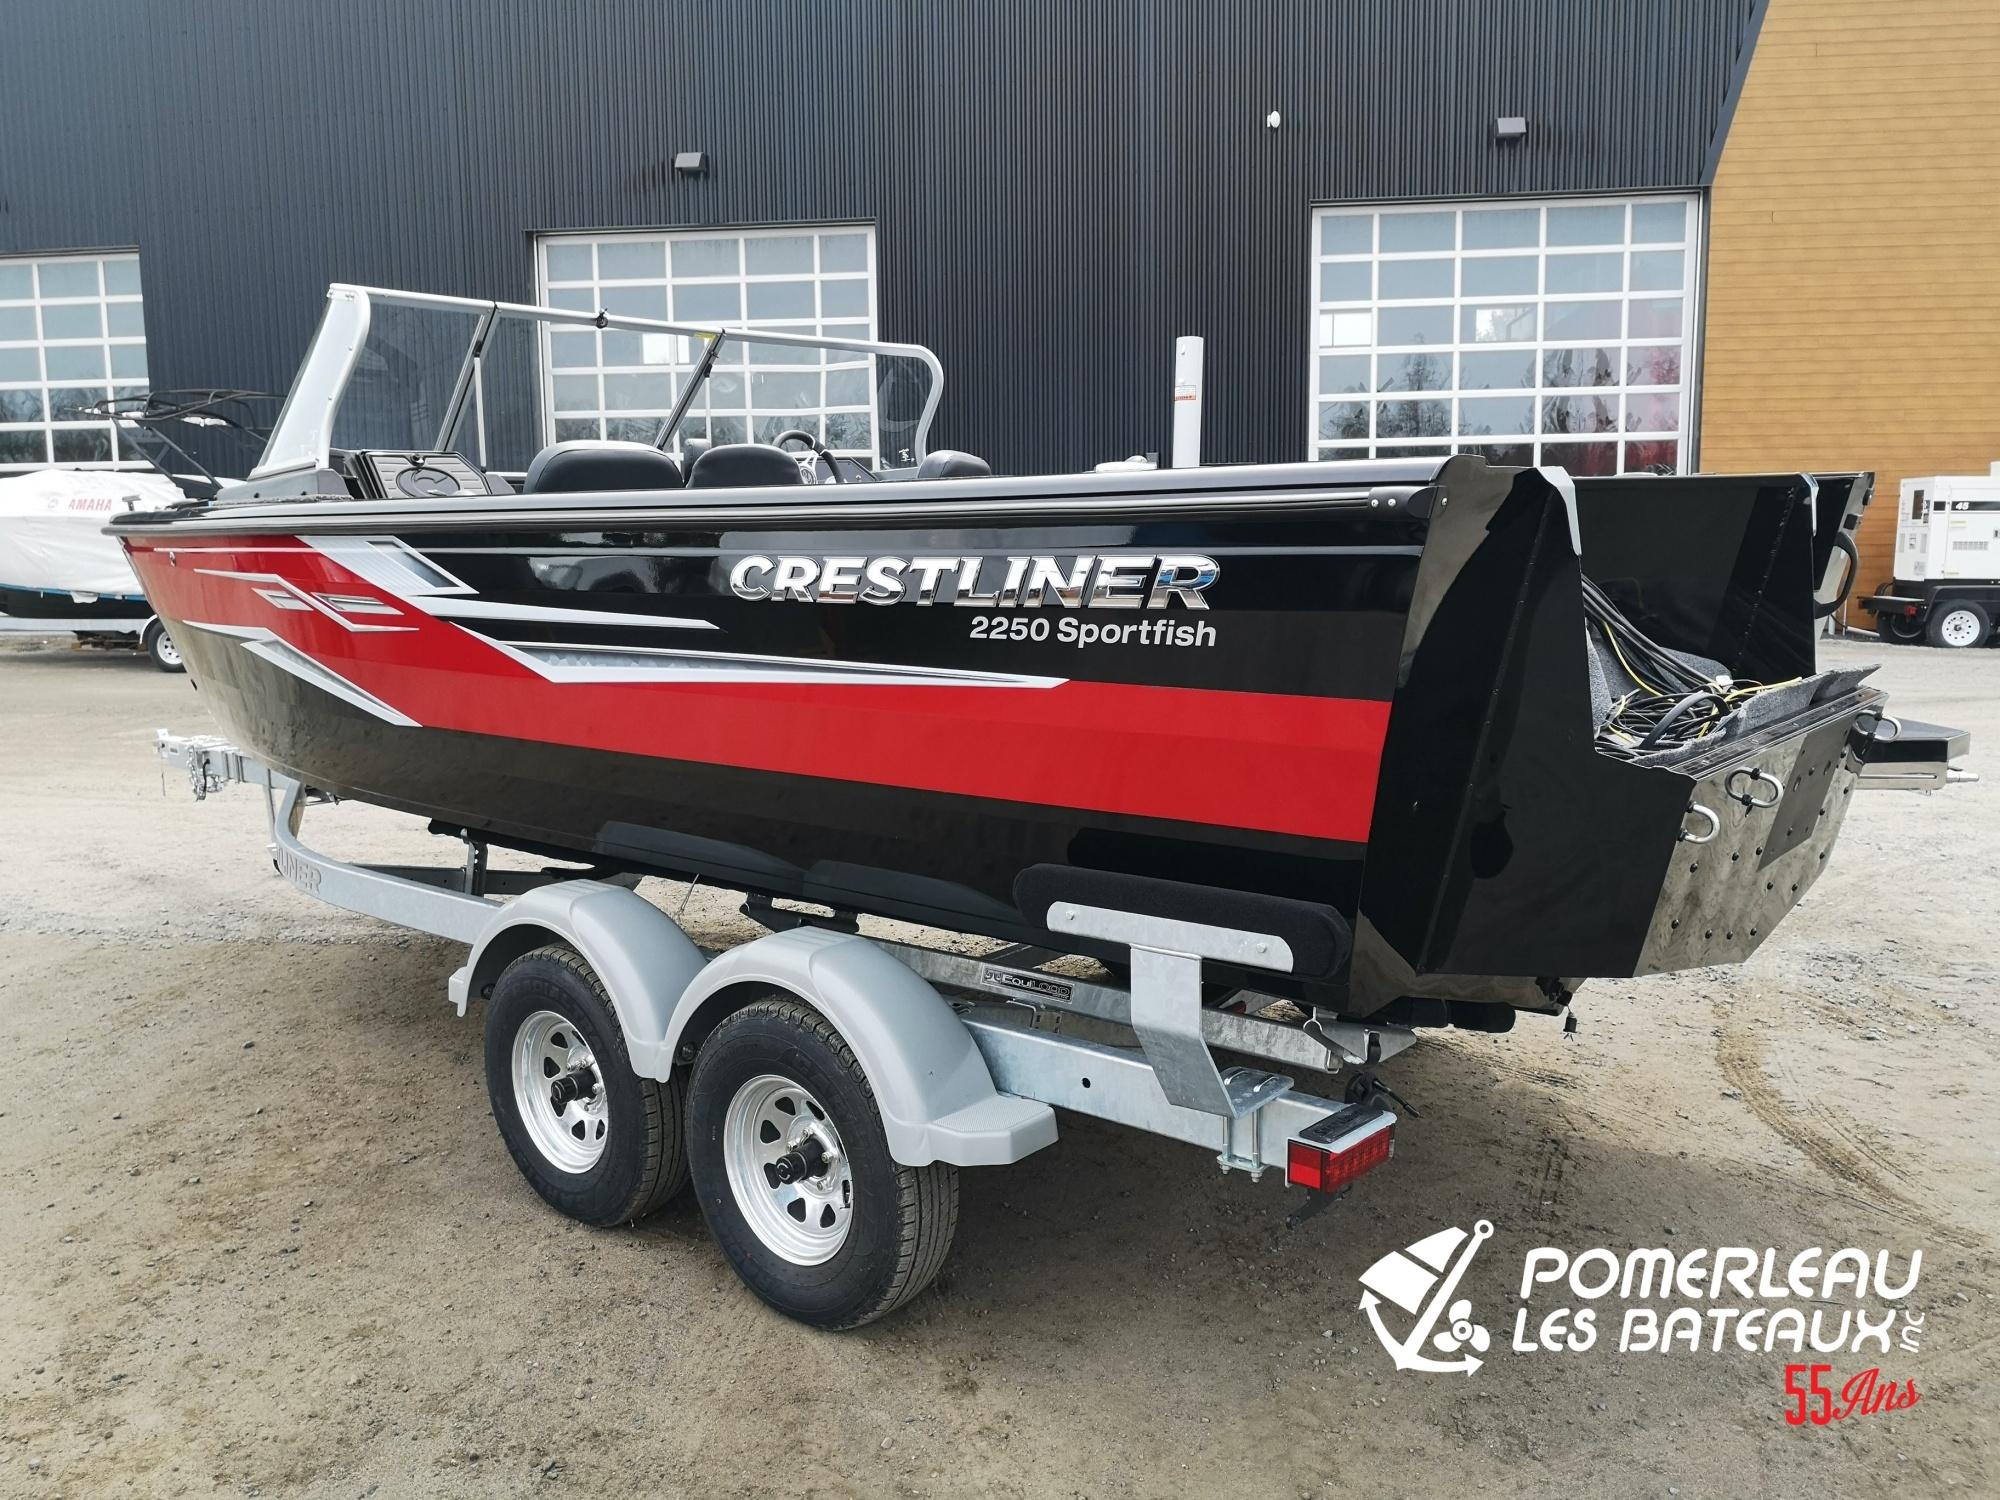 Crestliner Sportfish 2250 - IMG_20210503_140959